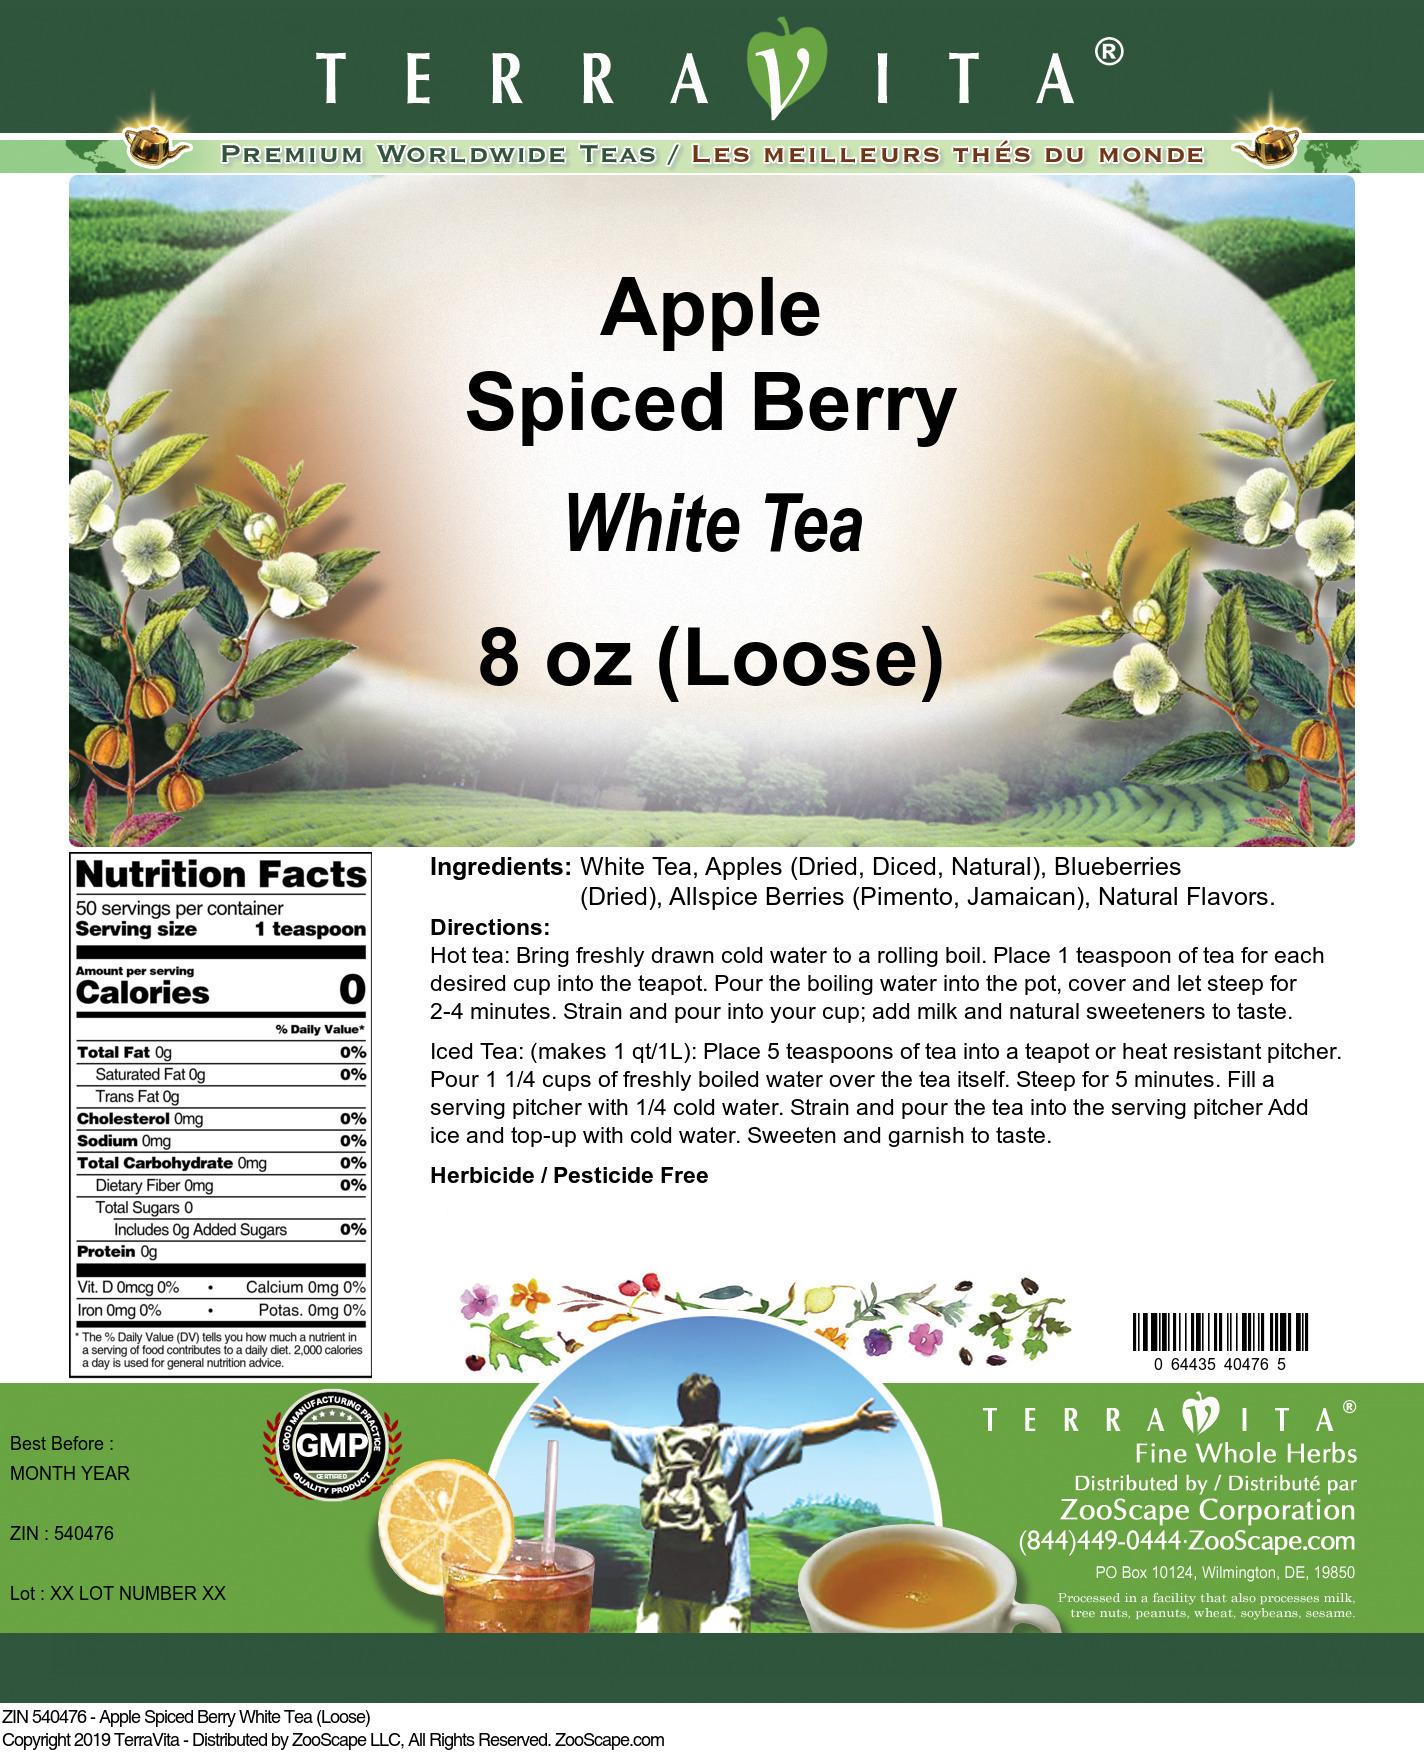 Apple Spiced Berry White Tea